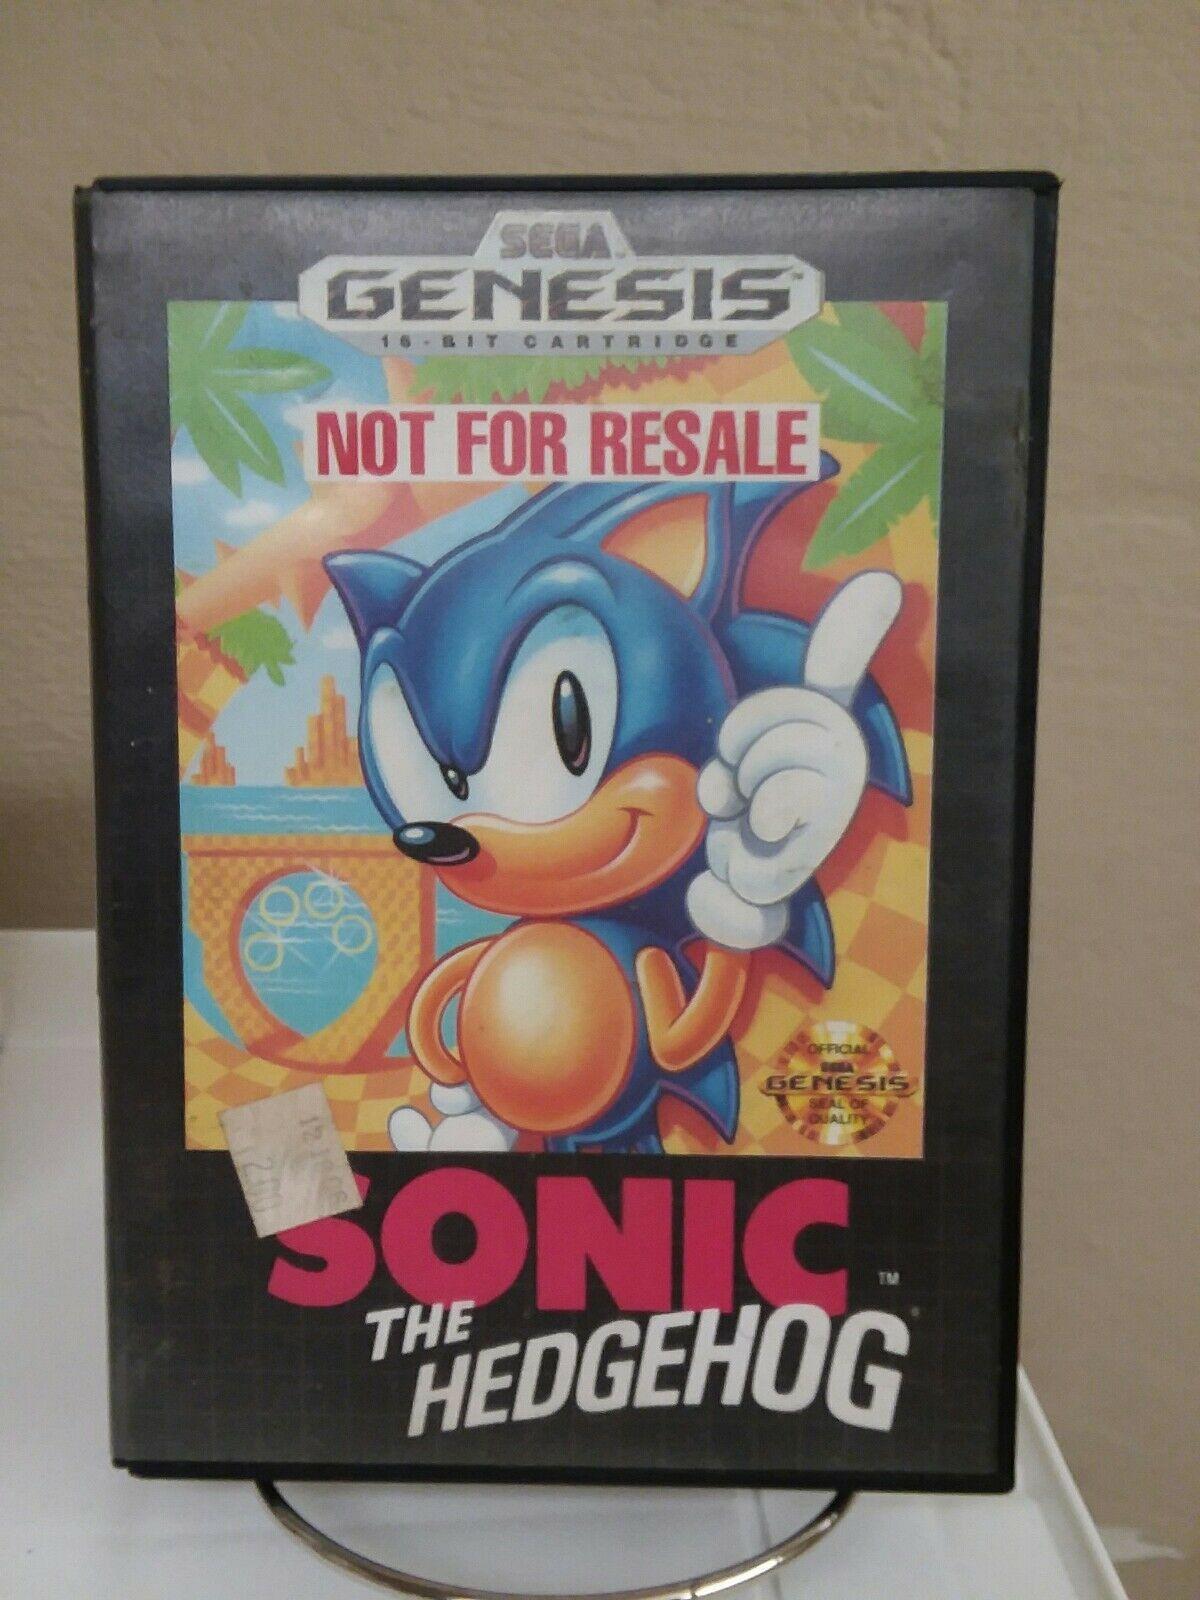 Sonic The Hedgehog Sega Genesis 1991 Not For Resale Copy For Sale